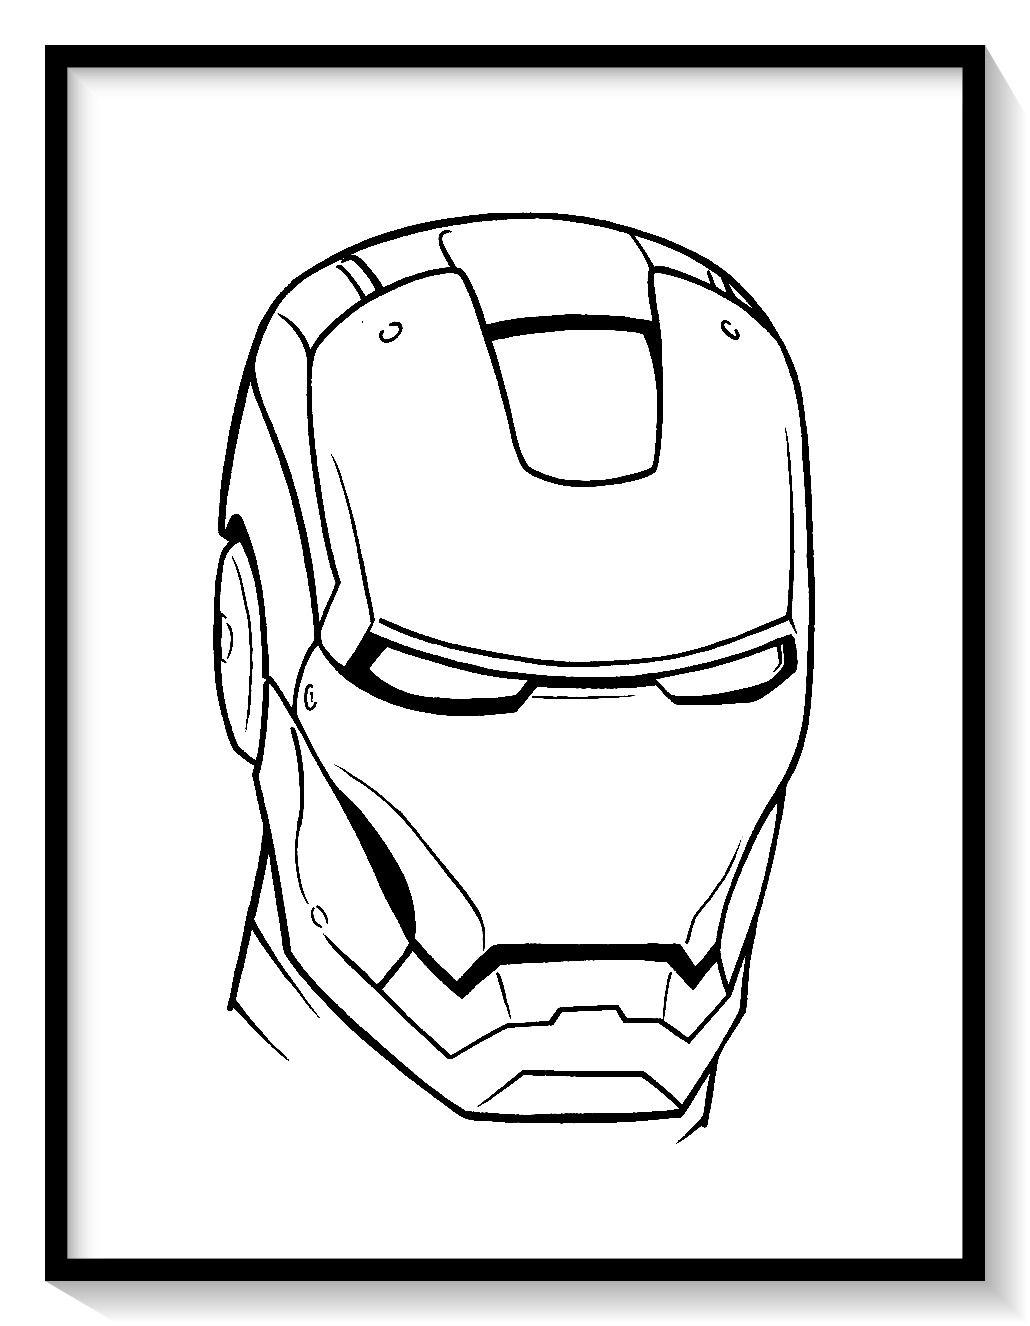 Pin De Dibujo Imagenes En Unicornios Para Pintar Iron Man Para Colorear Ironman Dibujo Unicornios Para Pintar